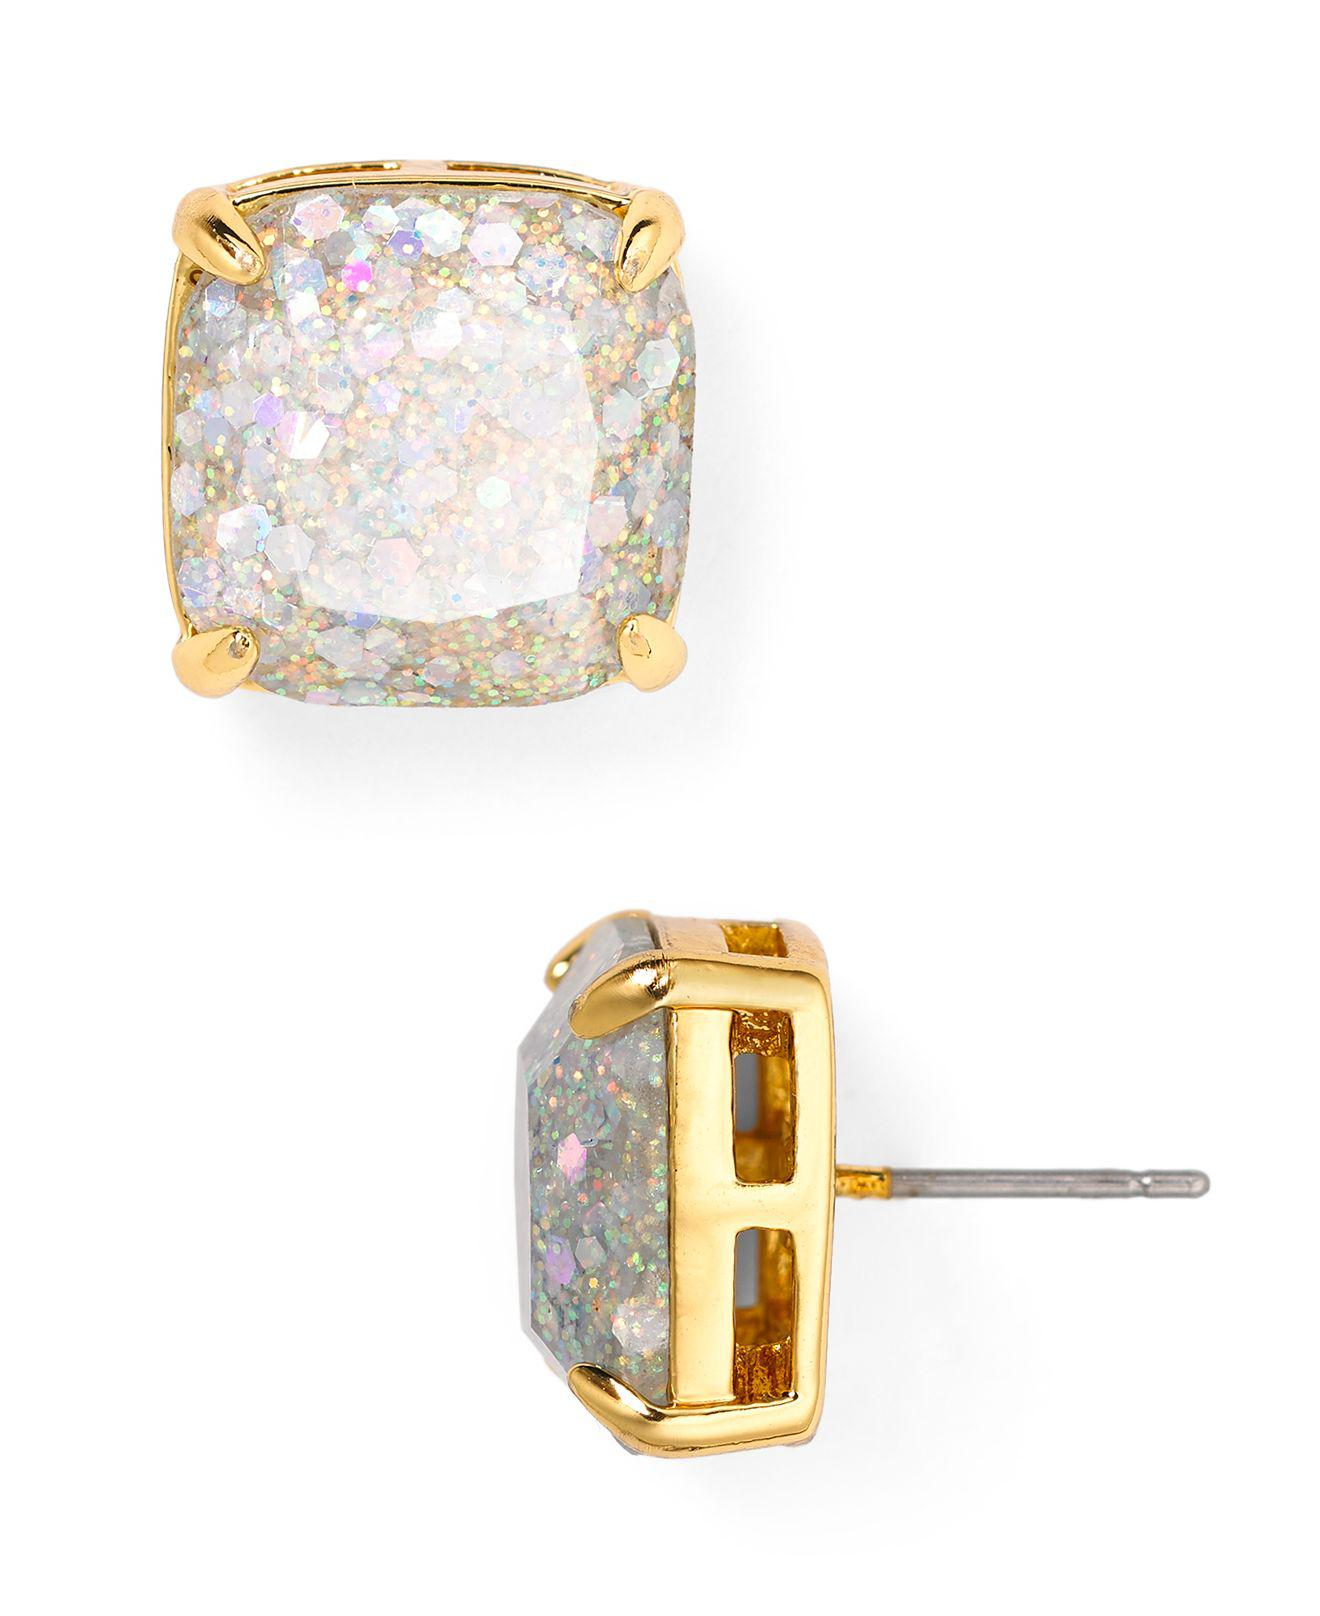 4dcef56e0 Kate Spade Pink New York Mini Small Glitter Stud Earrings Tradesy